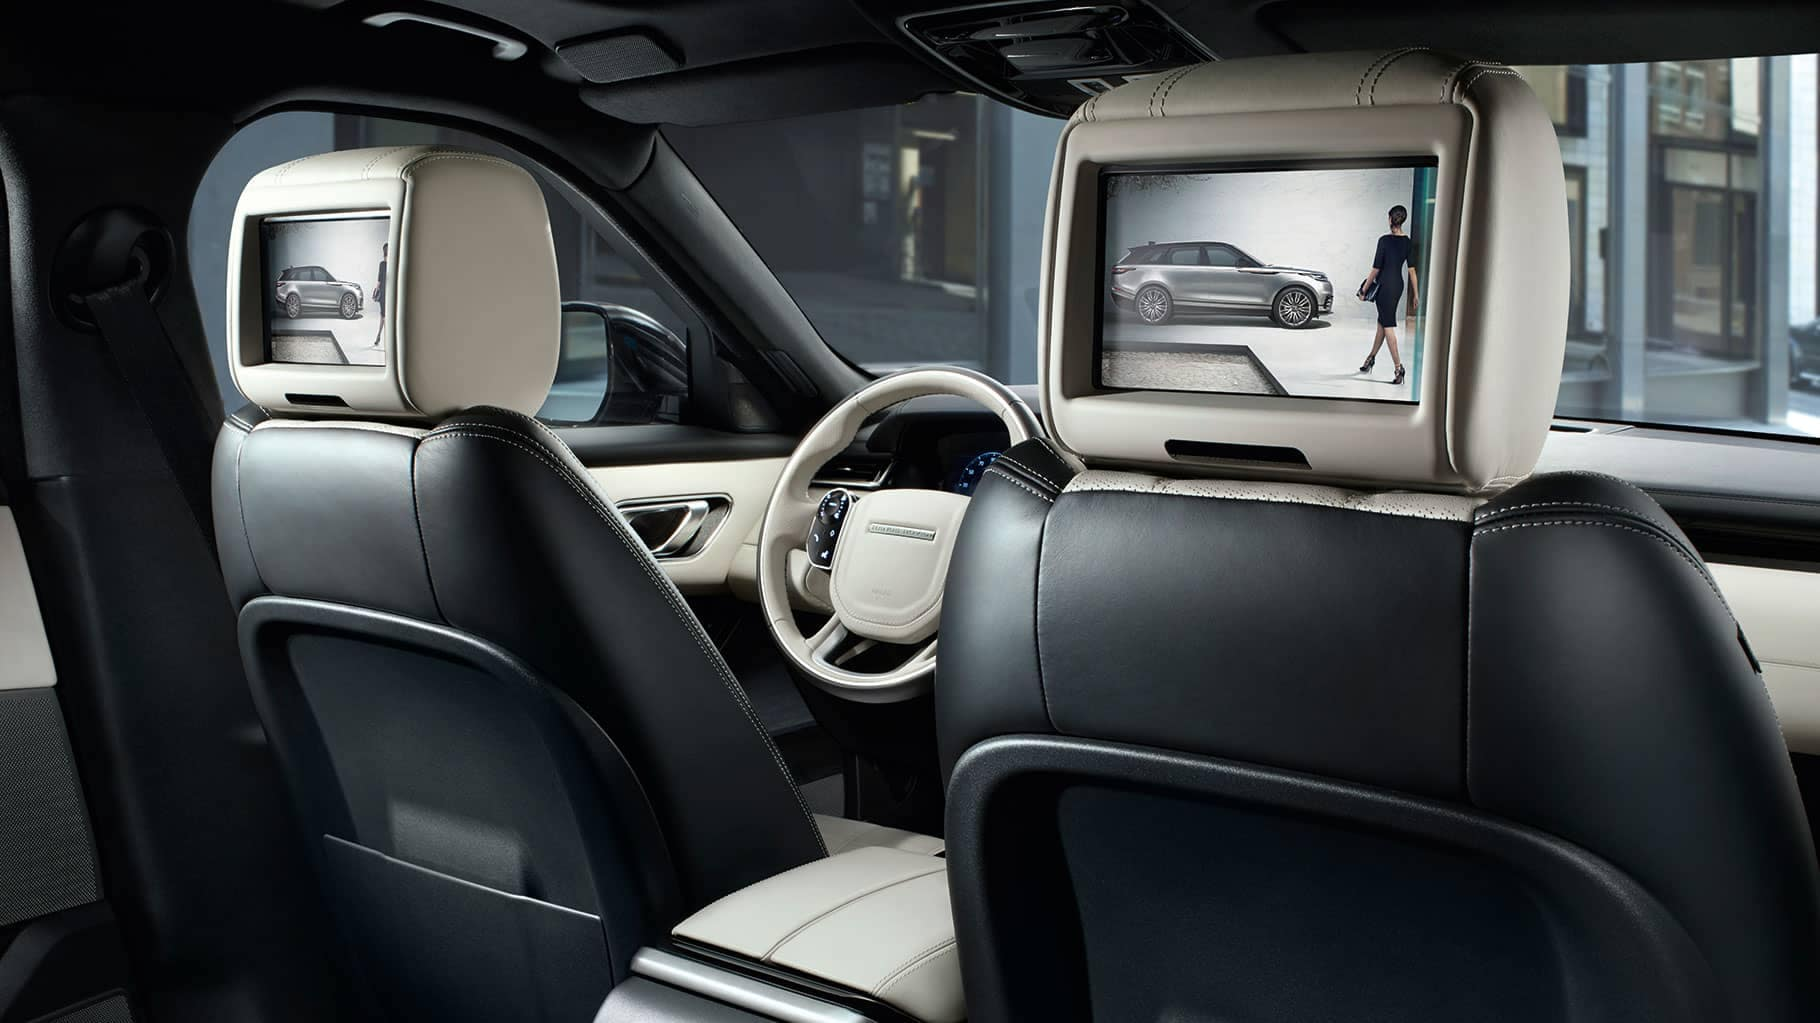 2019 Land Rover Range Rover Velar Interior Features